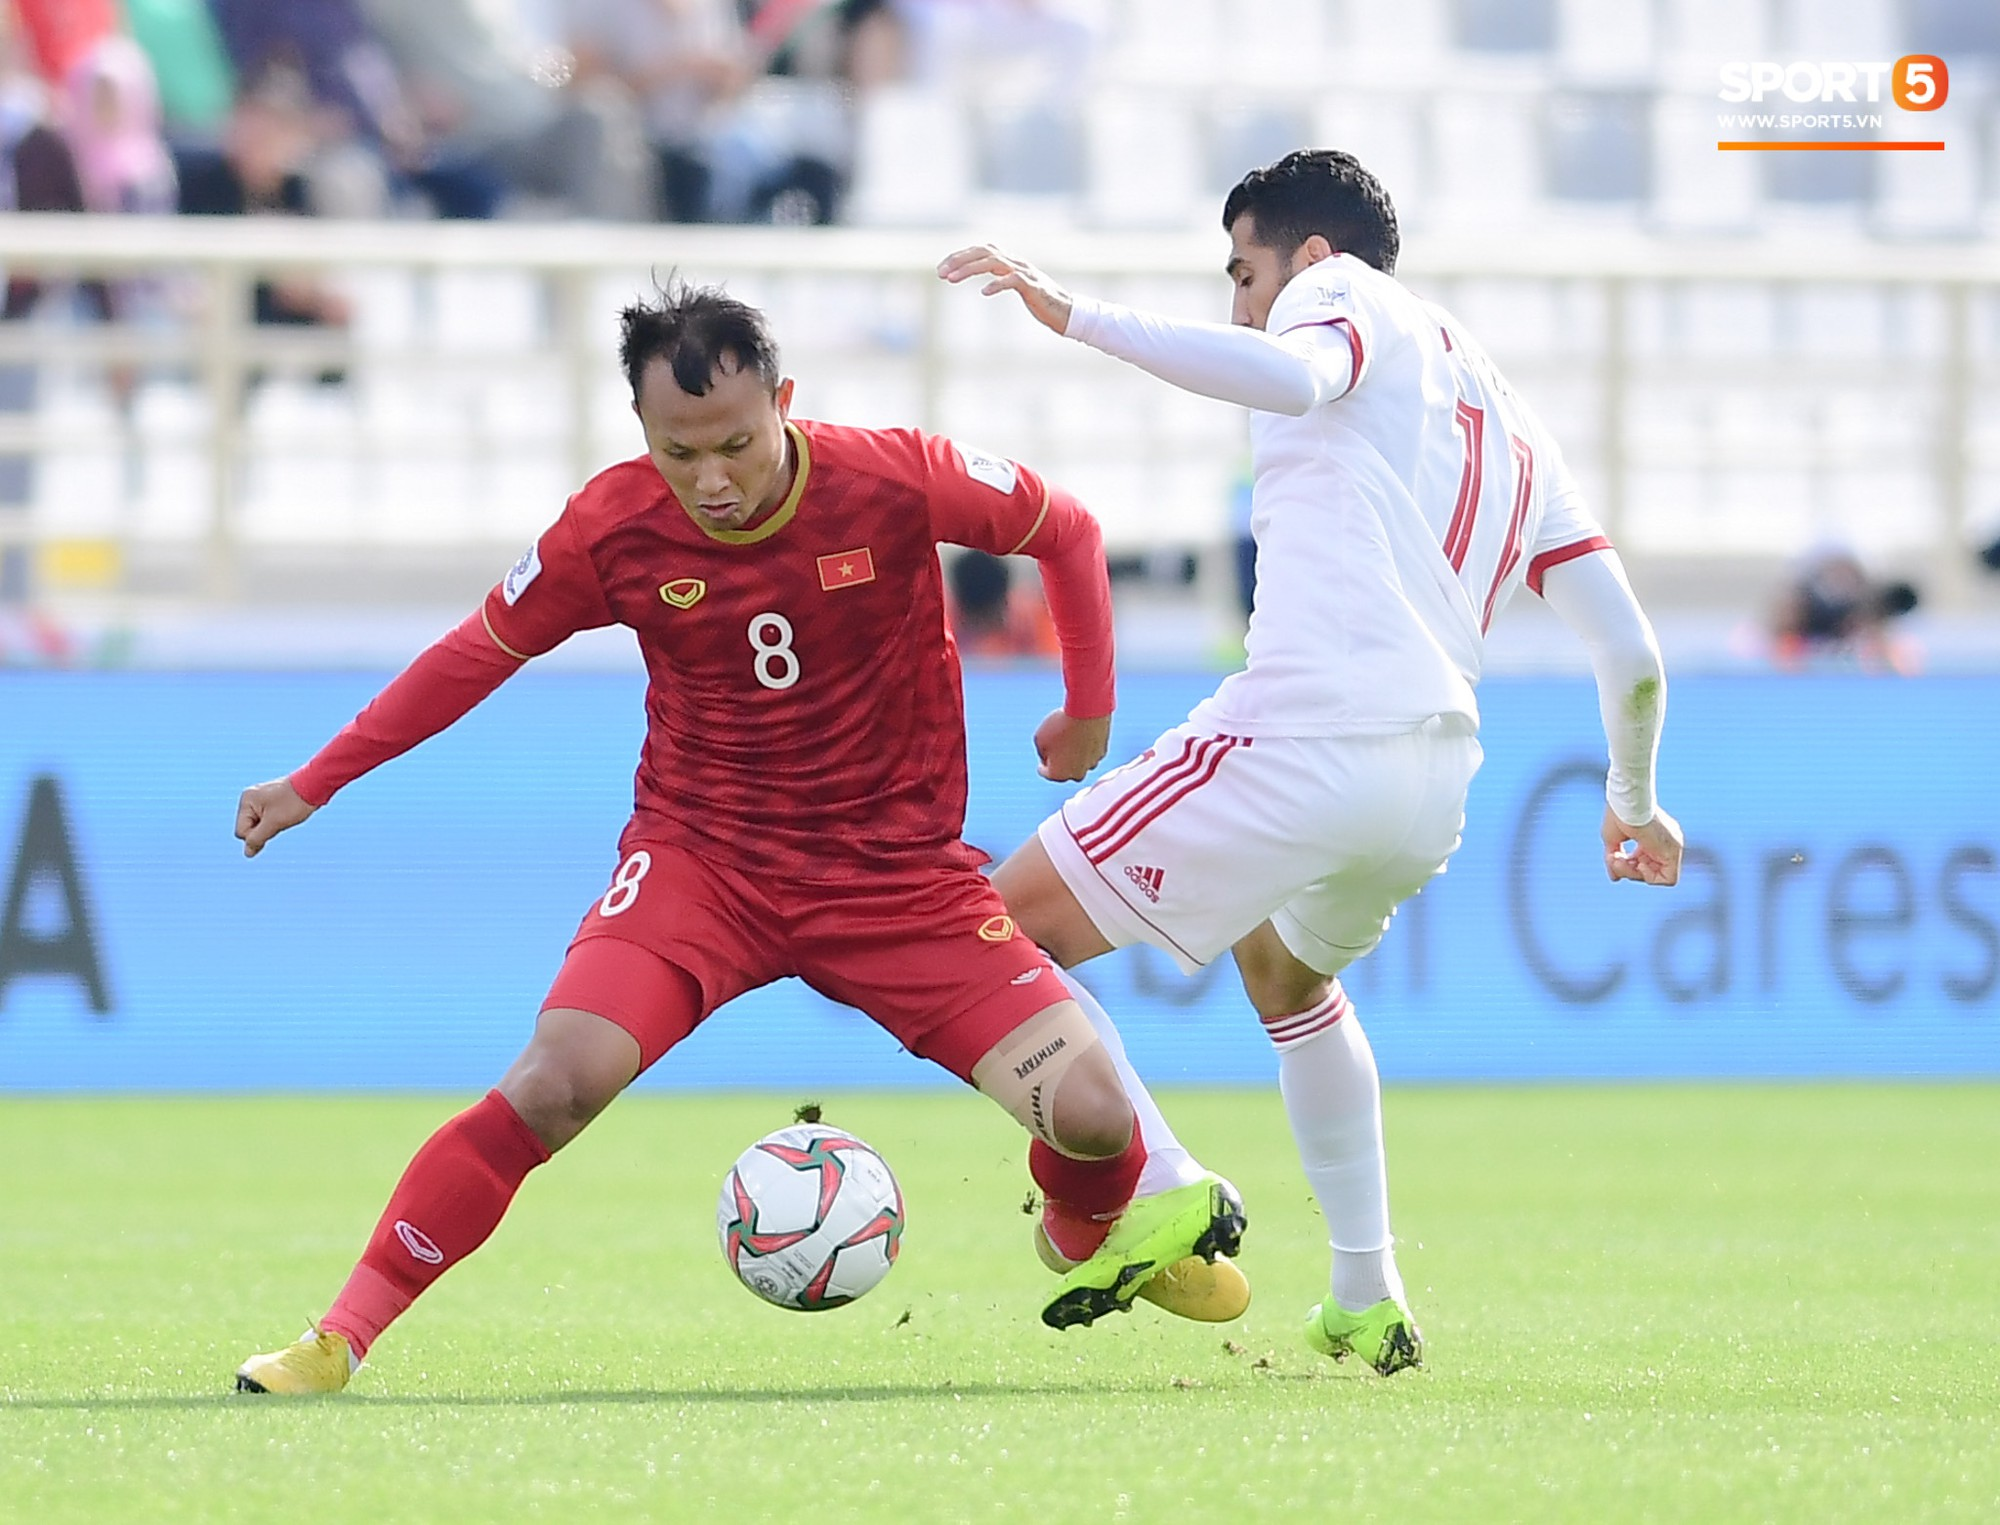 vietnamiranasiancup2019121115552099952352031871628cbe9c13fcfcp.jpg